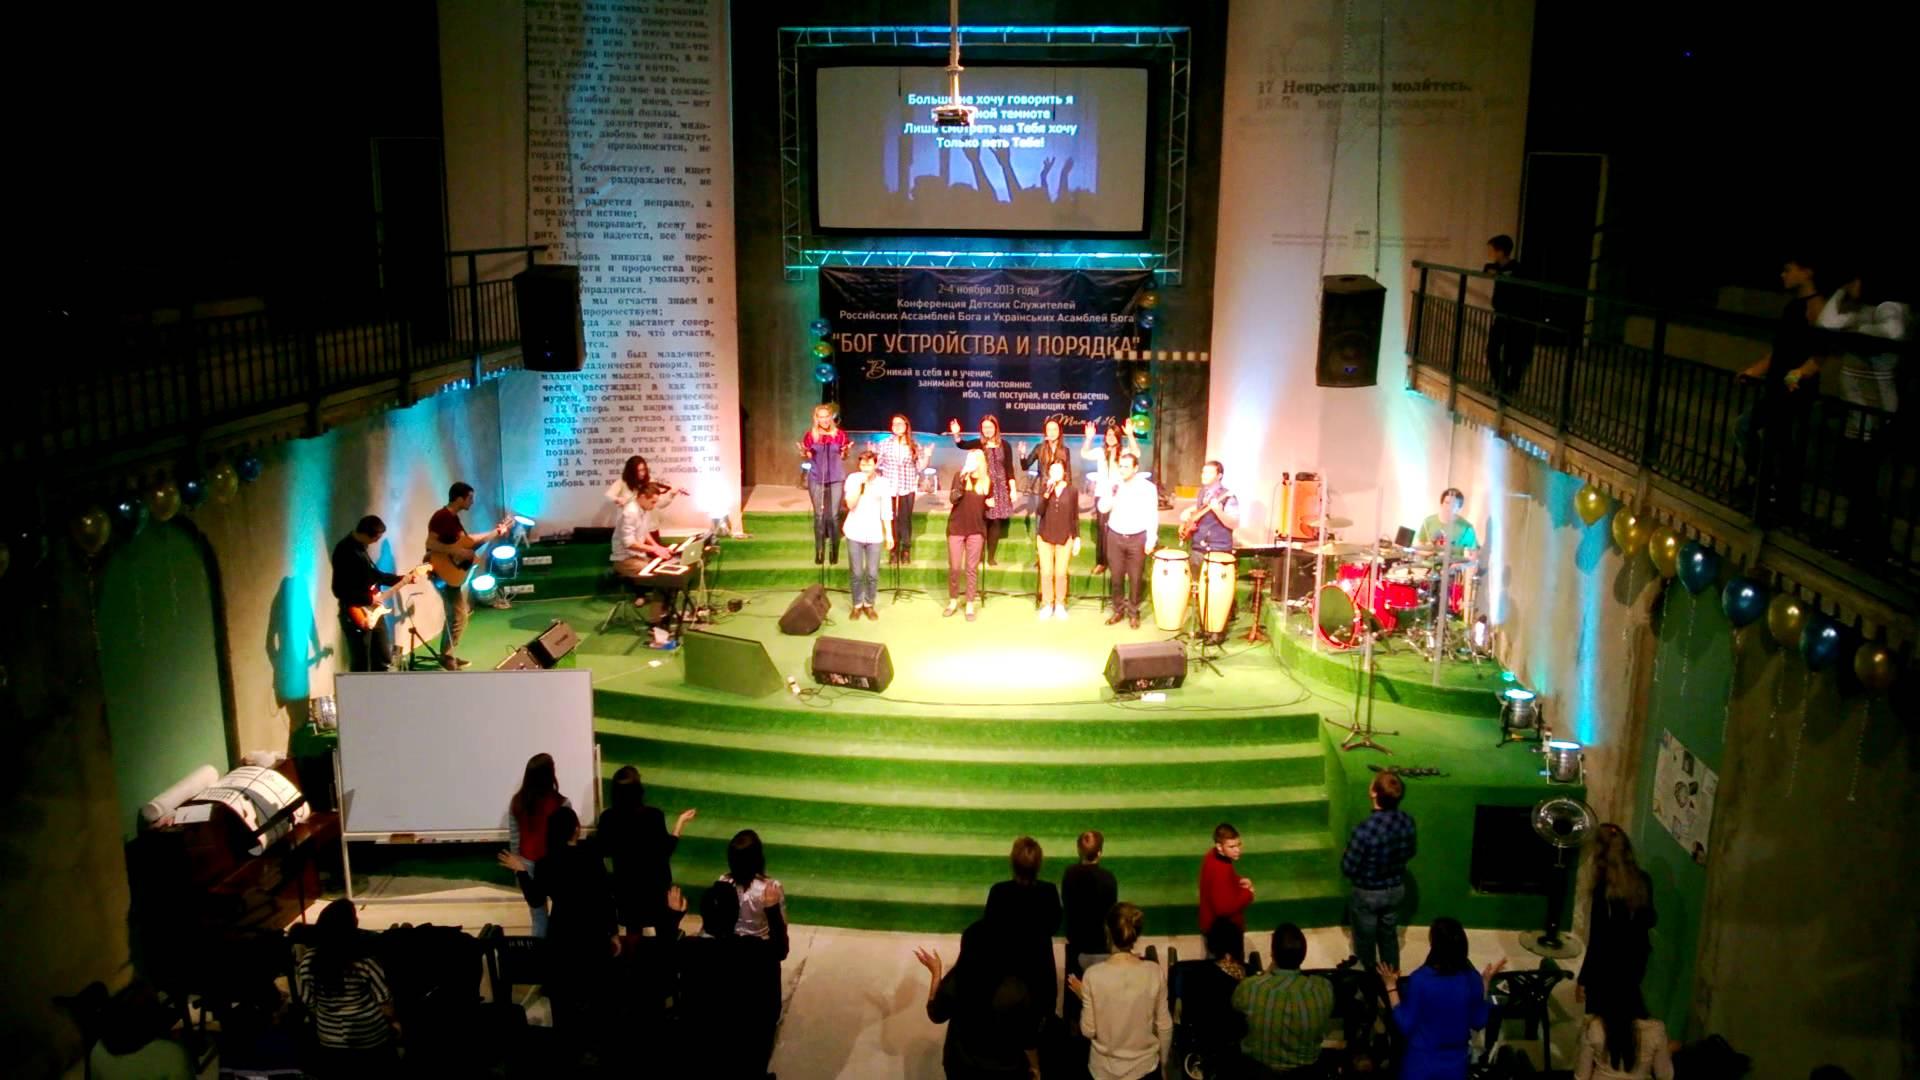 Церковь ХВЕ «Эммануил»